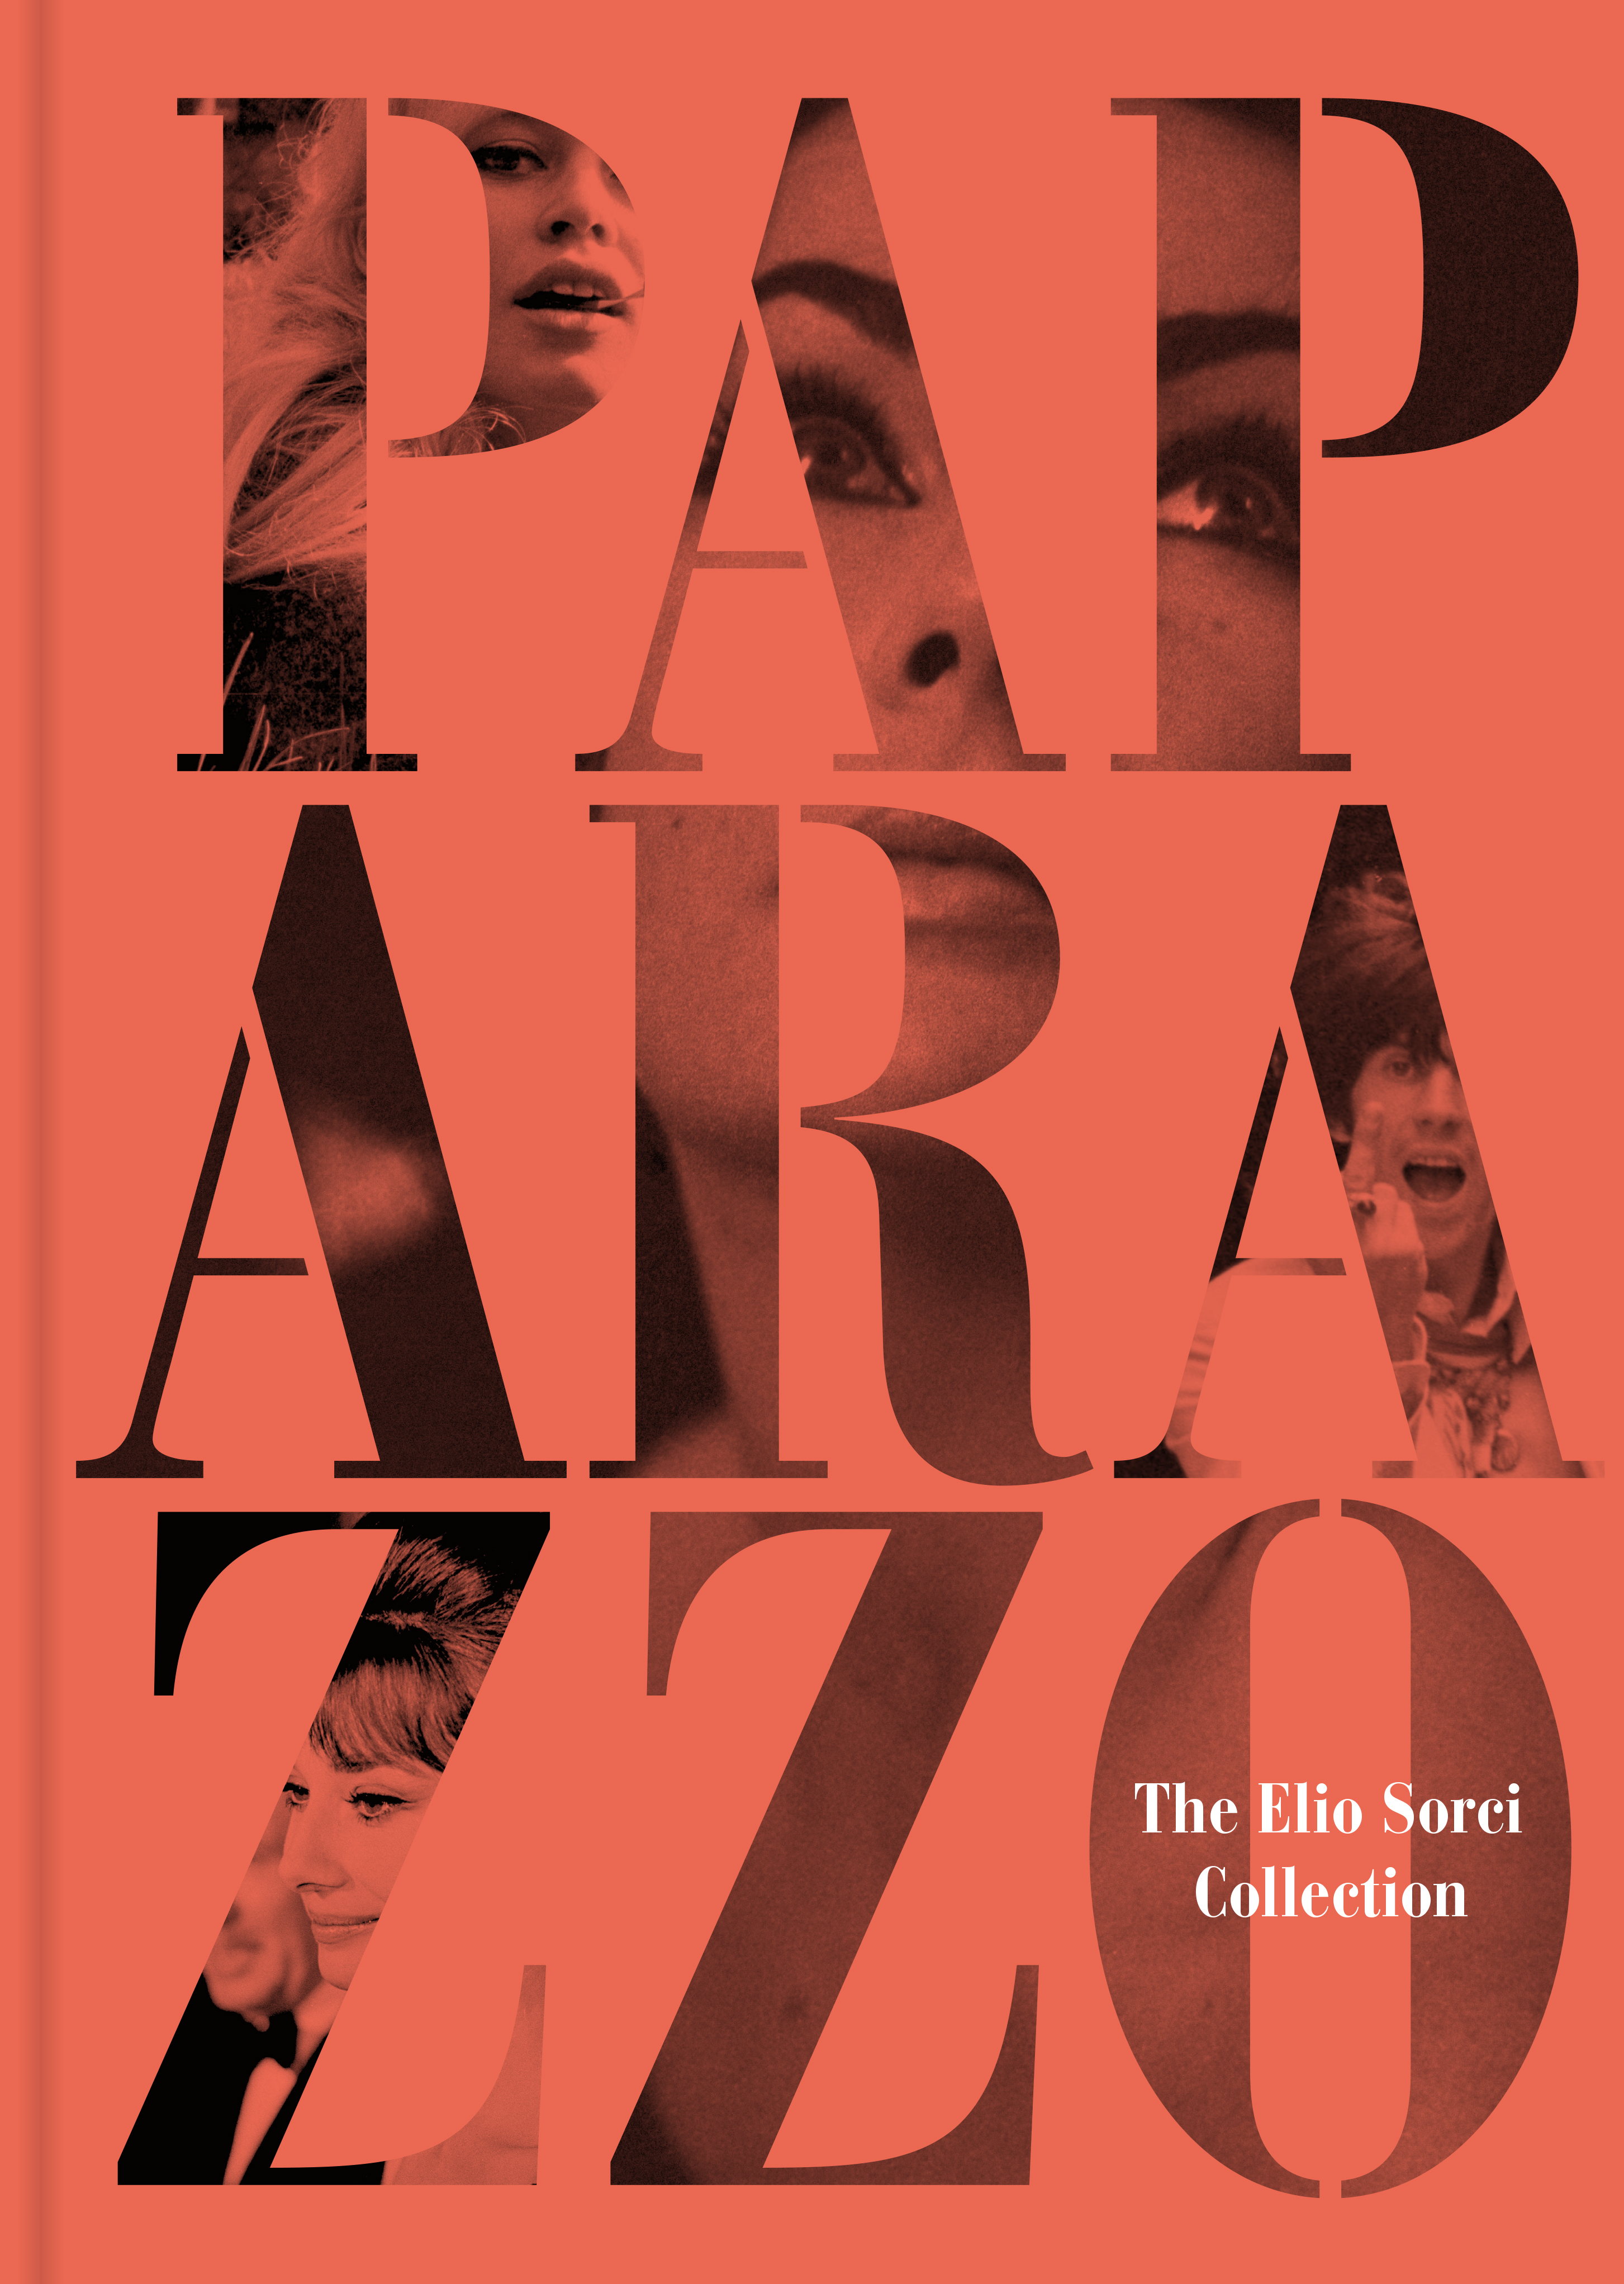 Cover image: Paparazzo (2014)